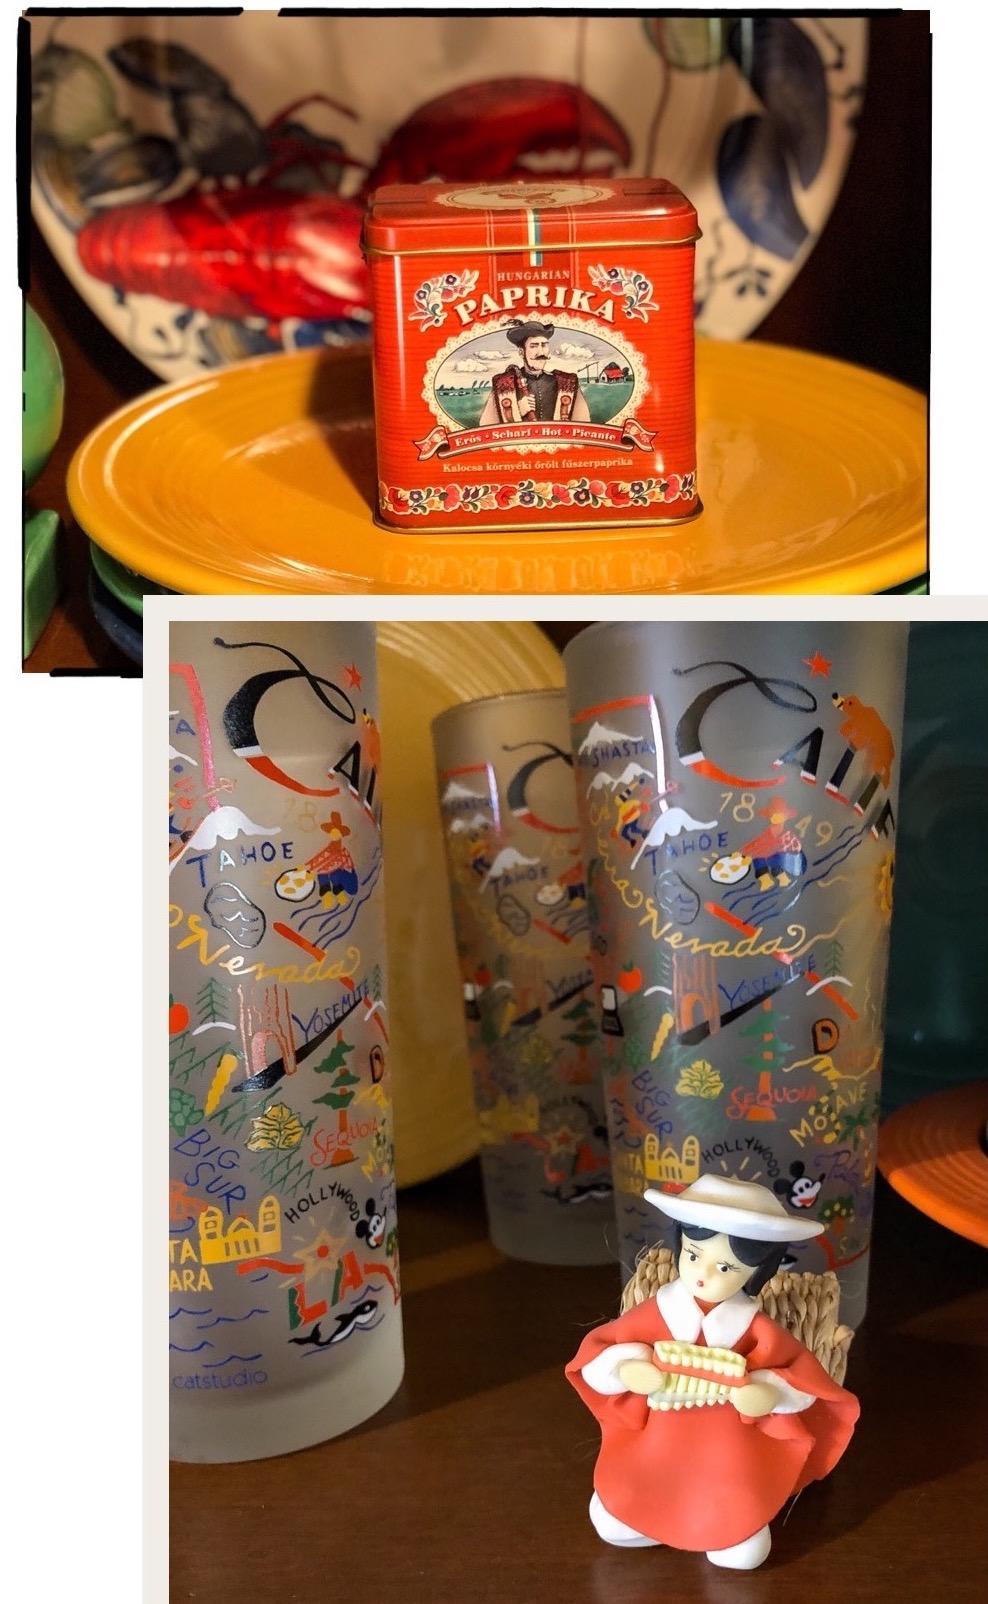 Hungarian paprika and Quito napkin ring travel souvenirs